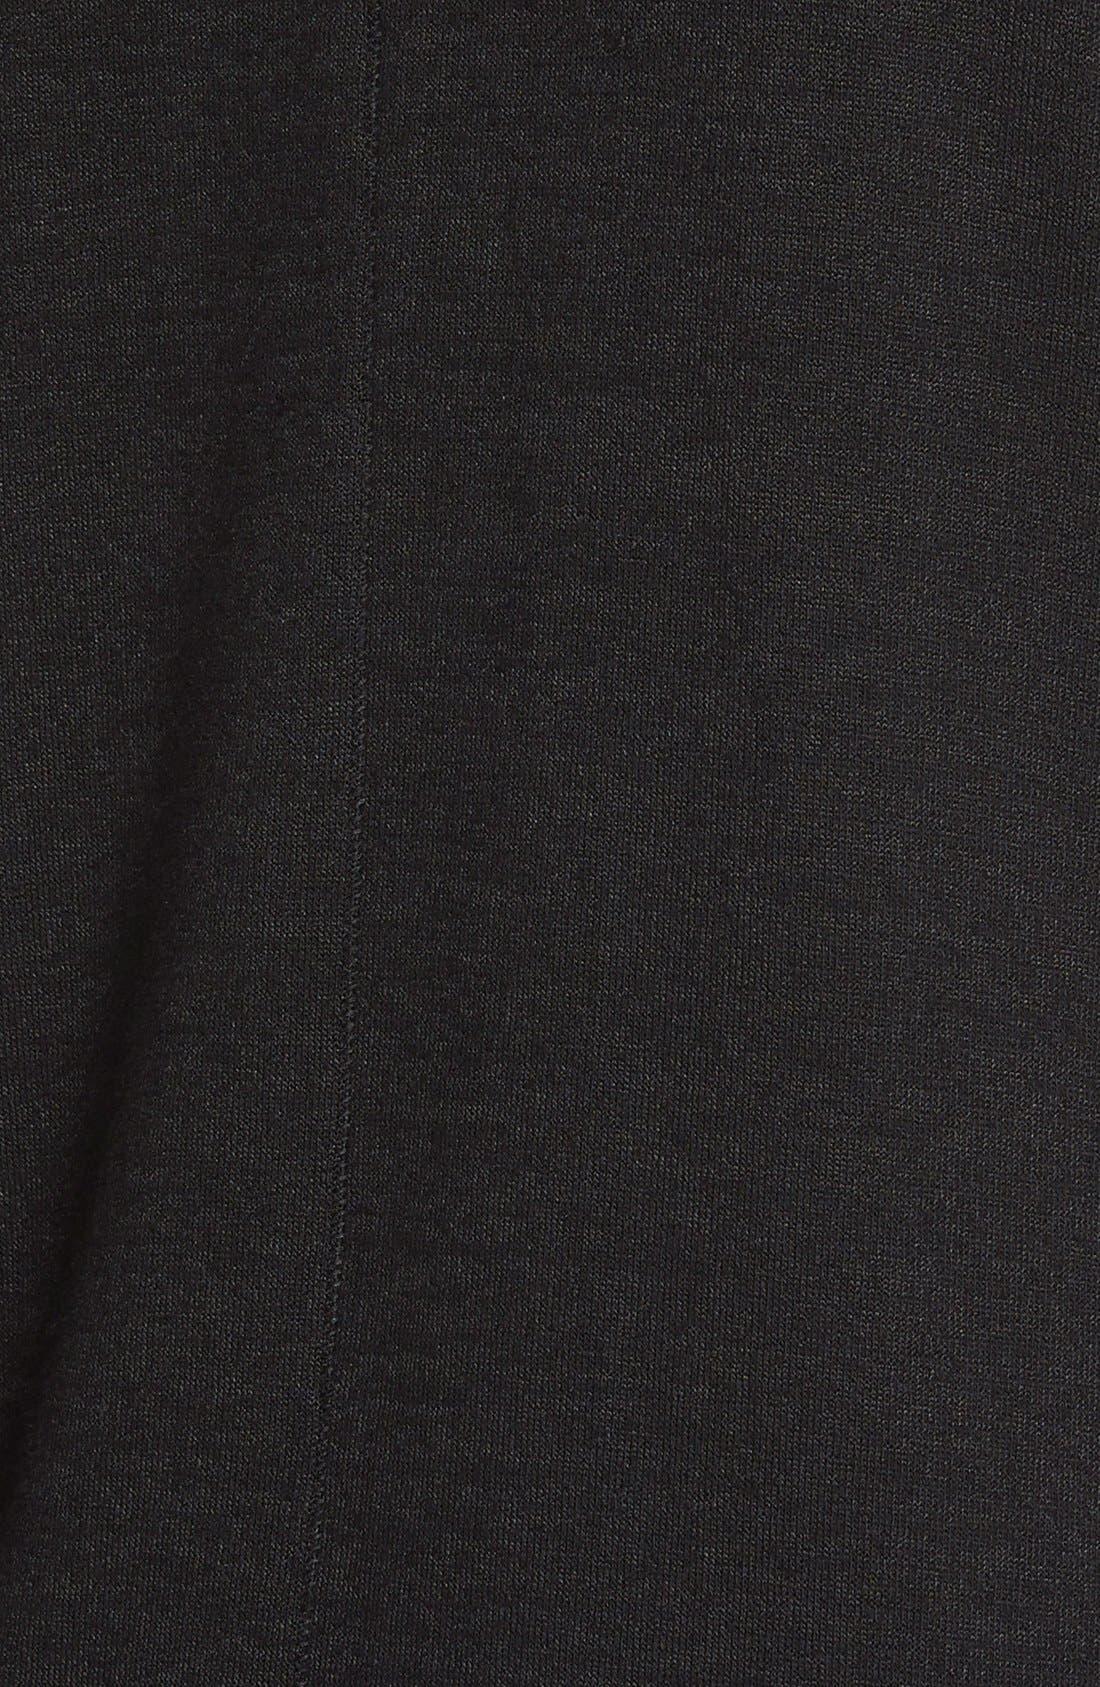 Alternate Image 3  - rag & bone/JEAN 'Theo' Long Sleeve V-Neck Pullover (Nordstrom Exclusive)